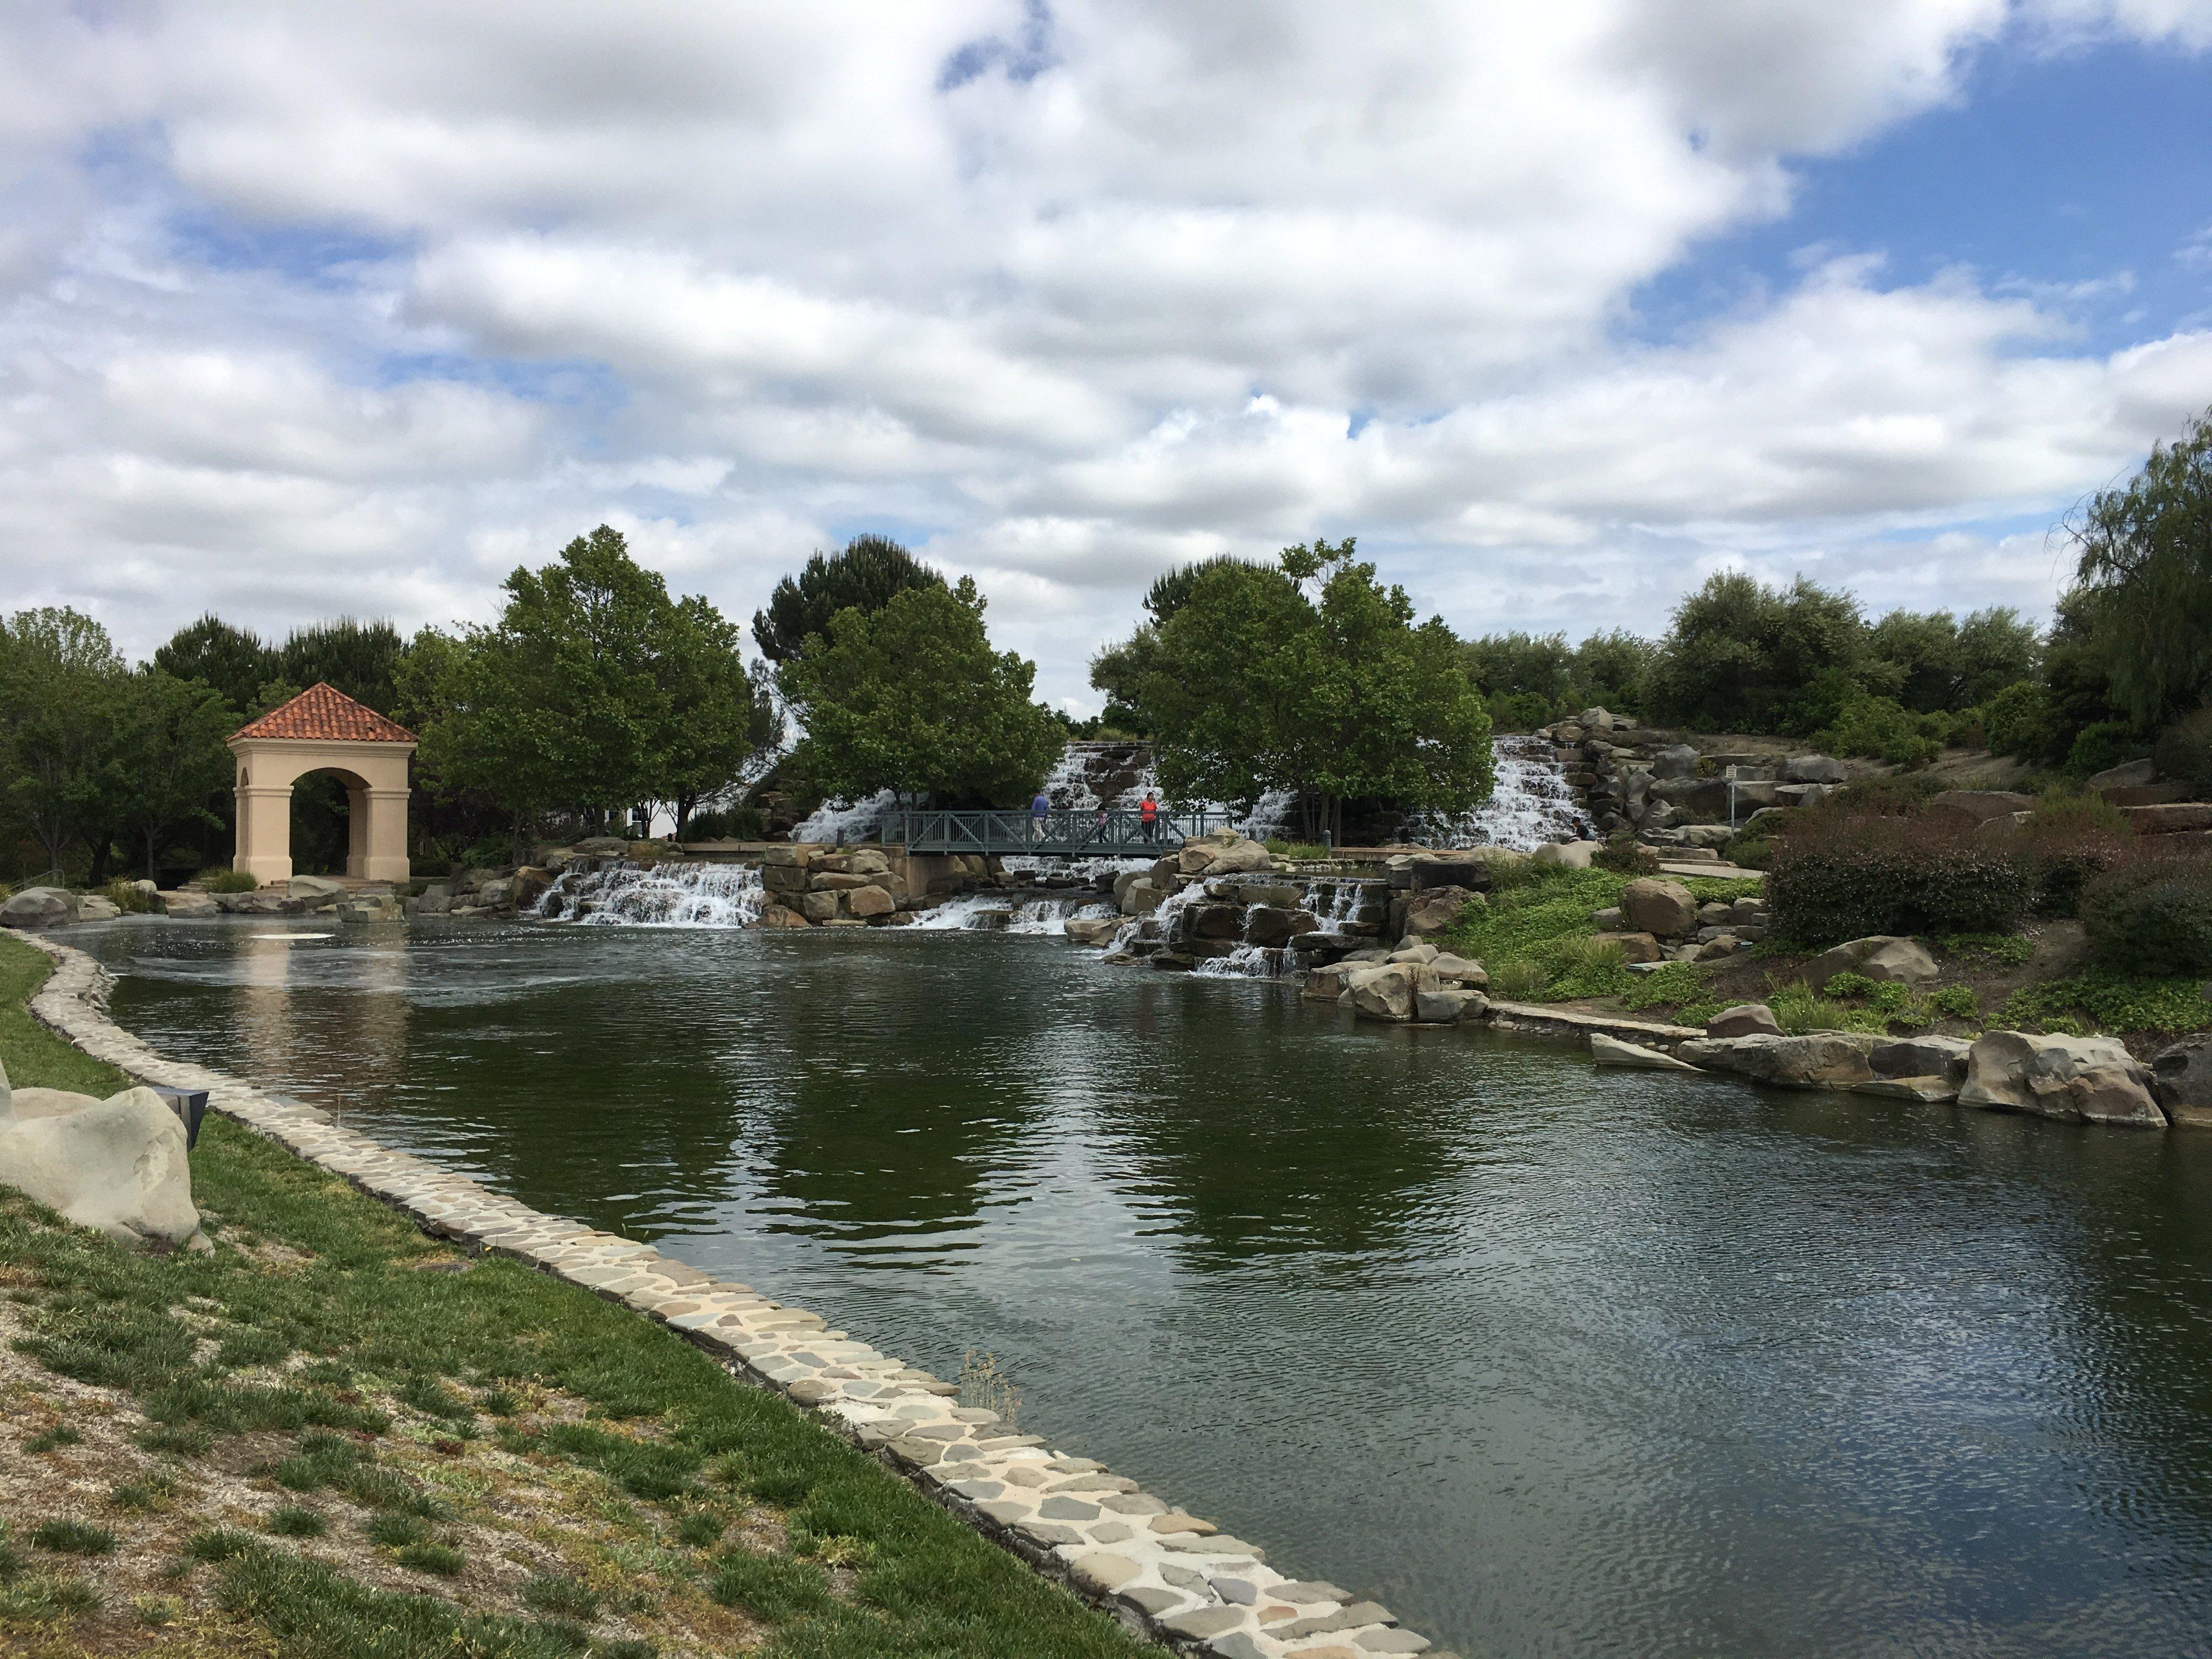 San_Ramon_Waterfall_Park_1_2016-05-15